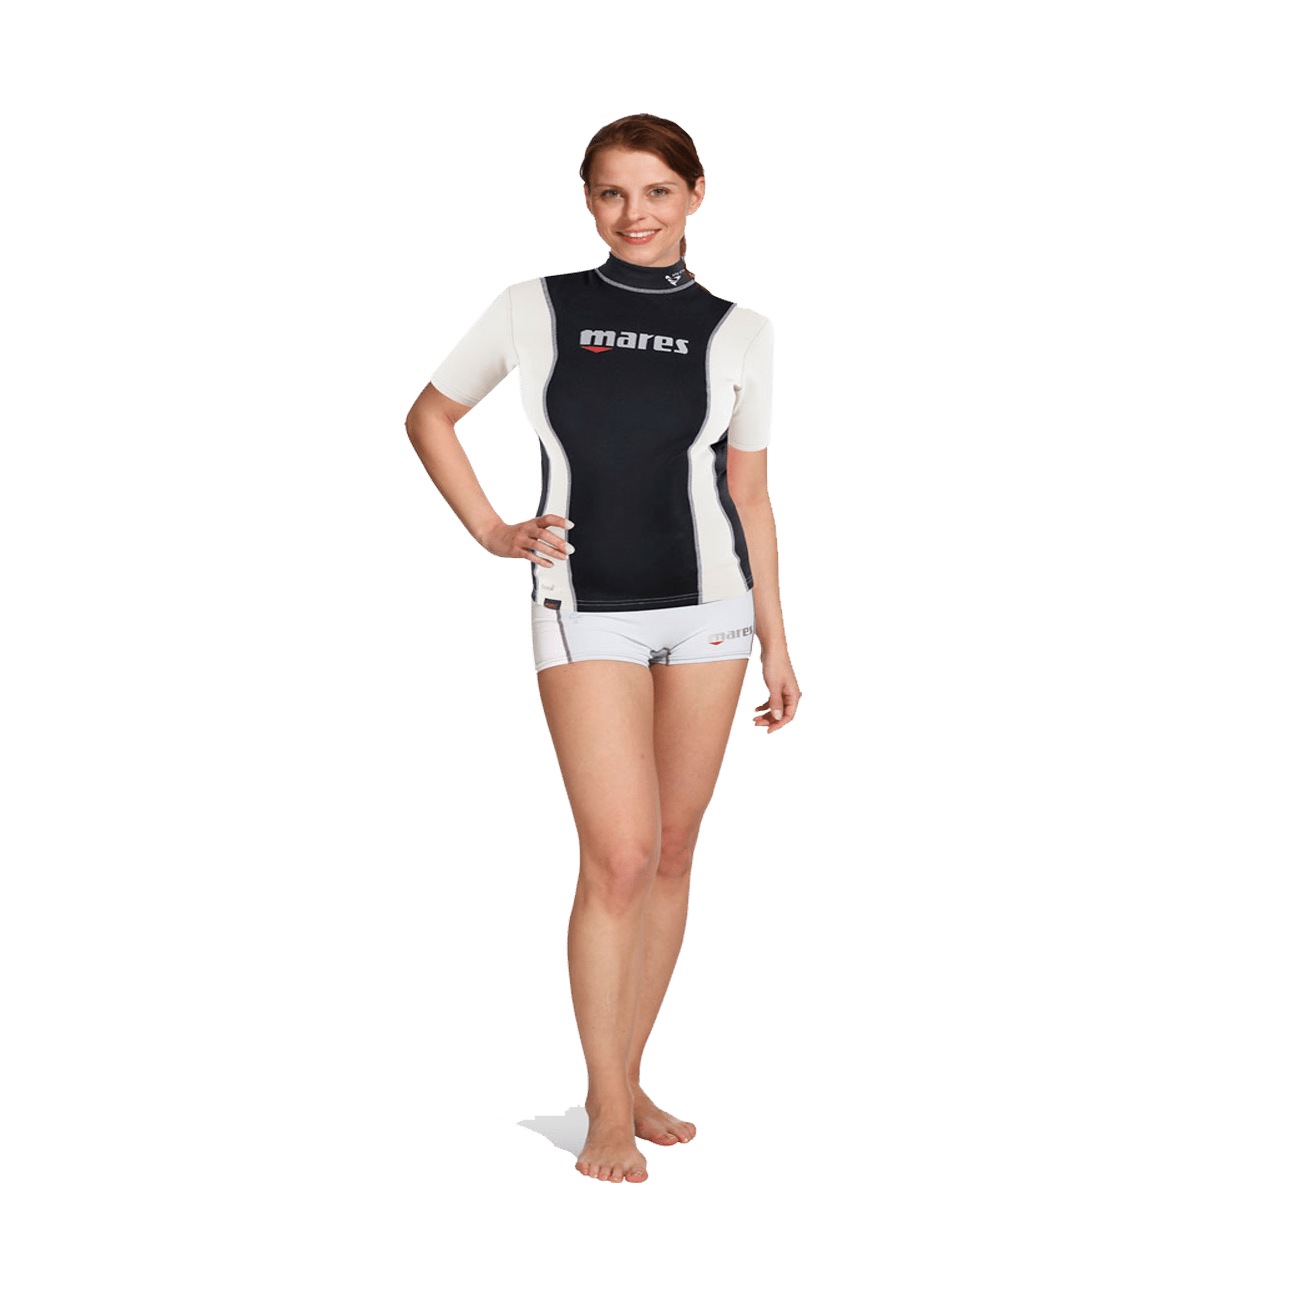 Mares Fire Skin Short Sleeve She Dives | Mares Rashguards | Mares Singapore